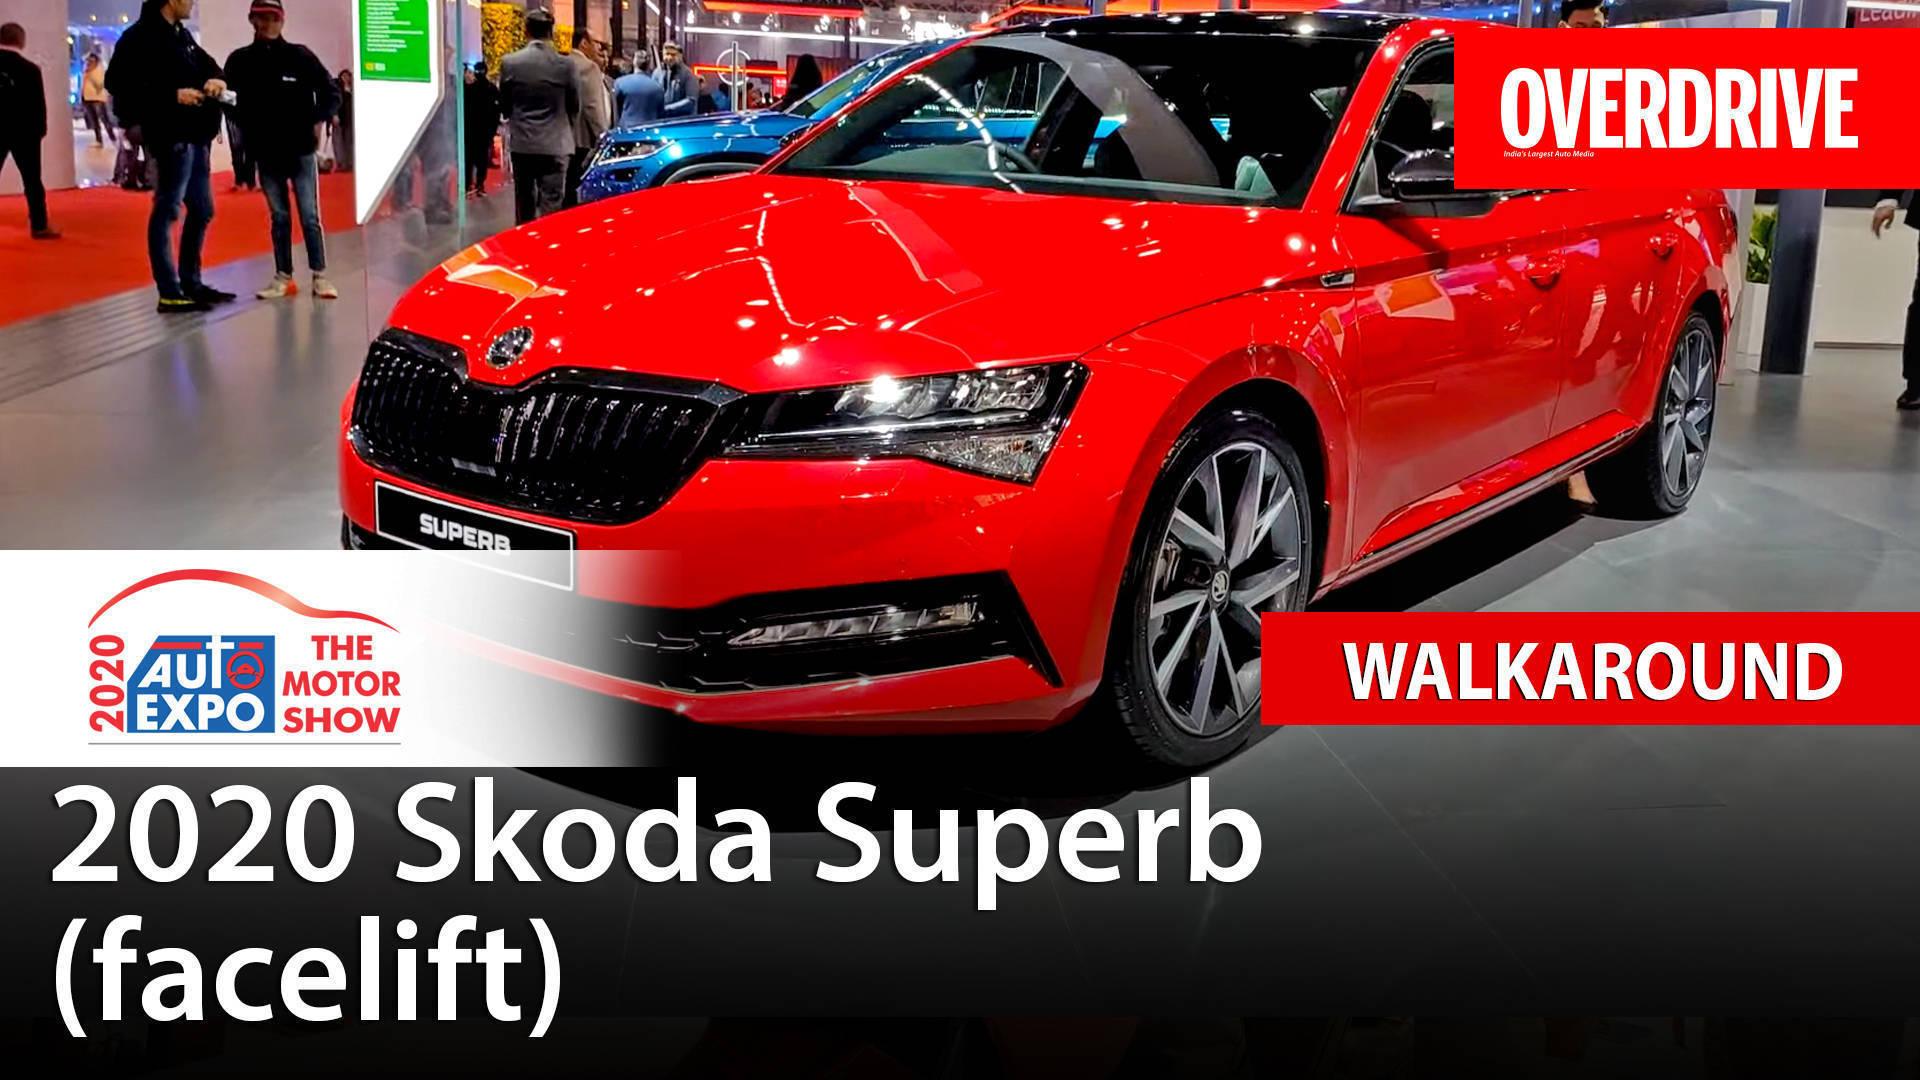 2020 Skoda Superb (facelift) - Auto Expo 2020